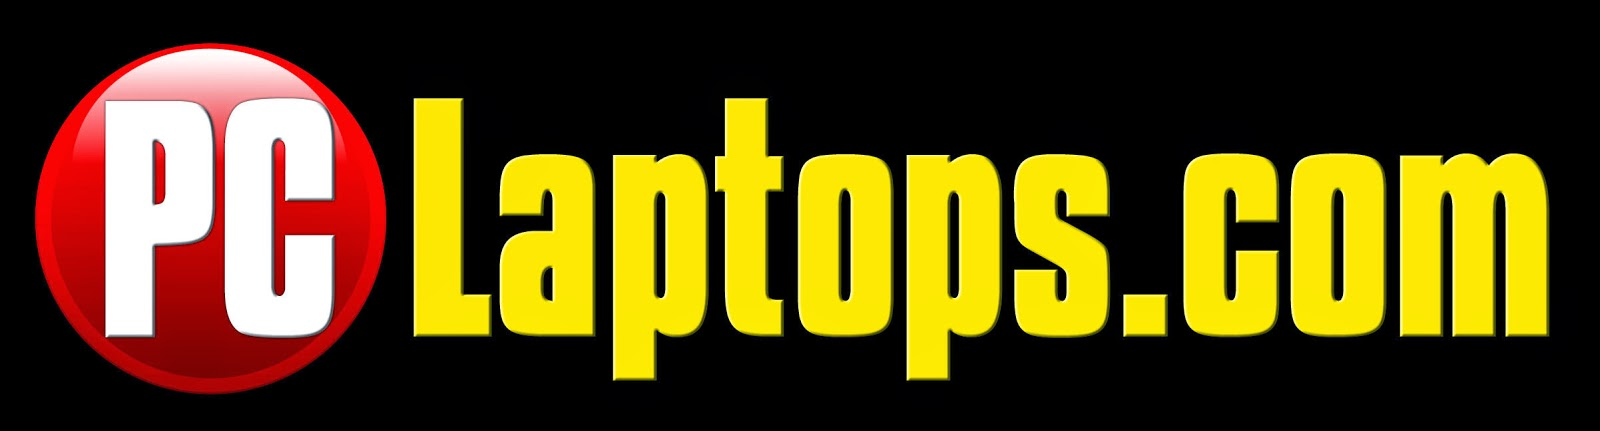 http://pclaptops.com/